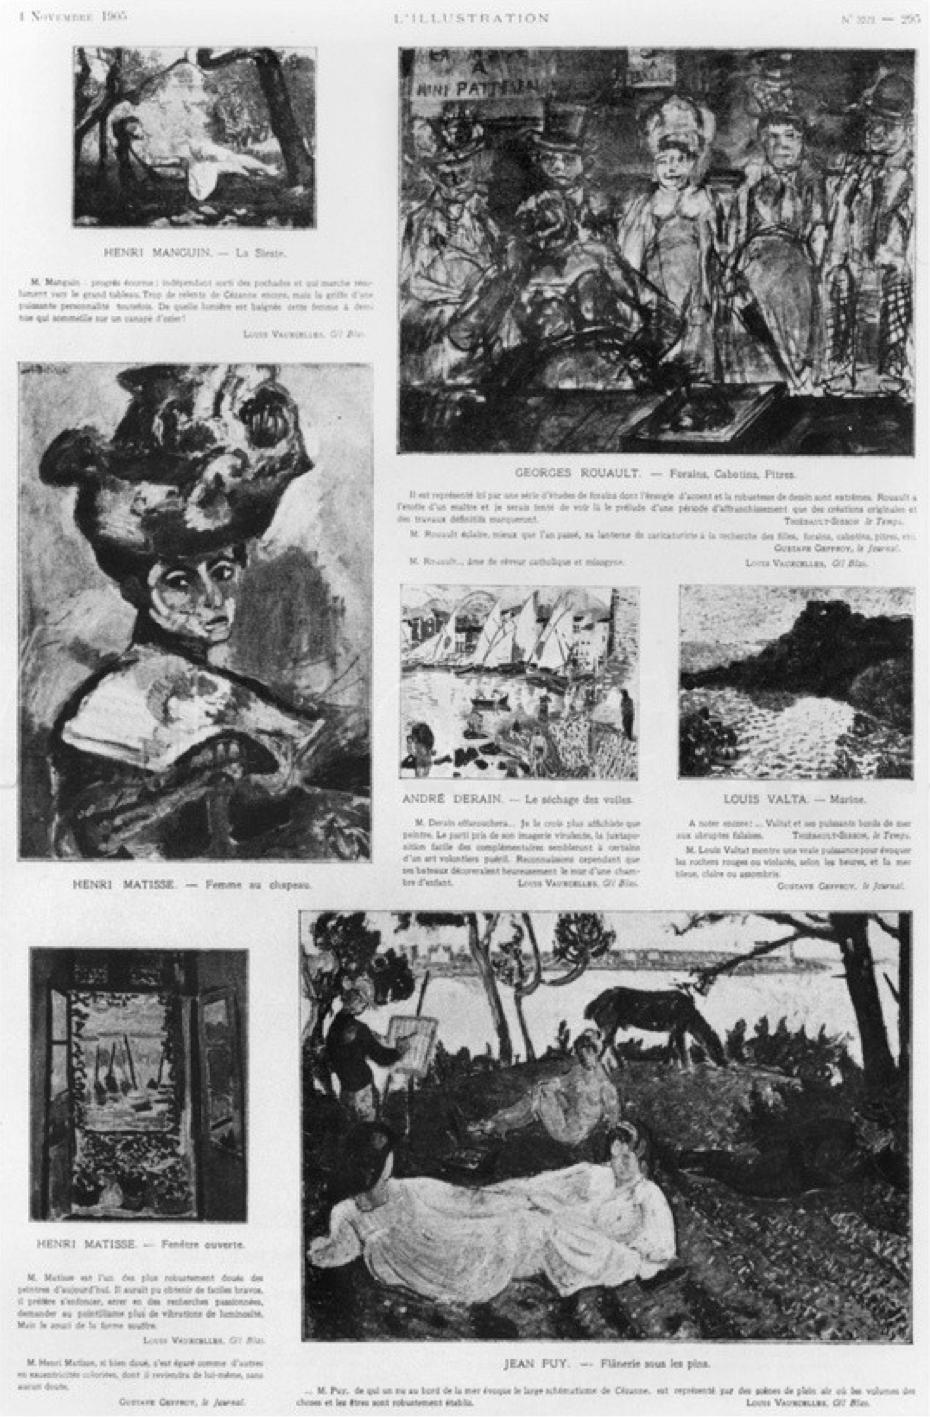 Les_Fauves,_Exhibition_at_the_Salon_D'Automne,_from_L'Illustration,_4_November_1905p.295